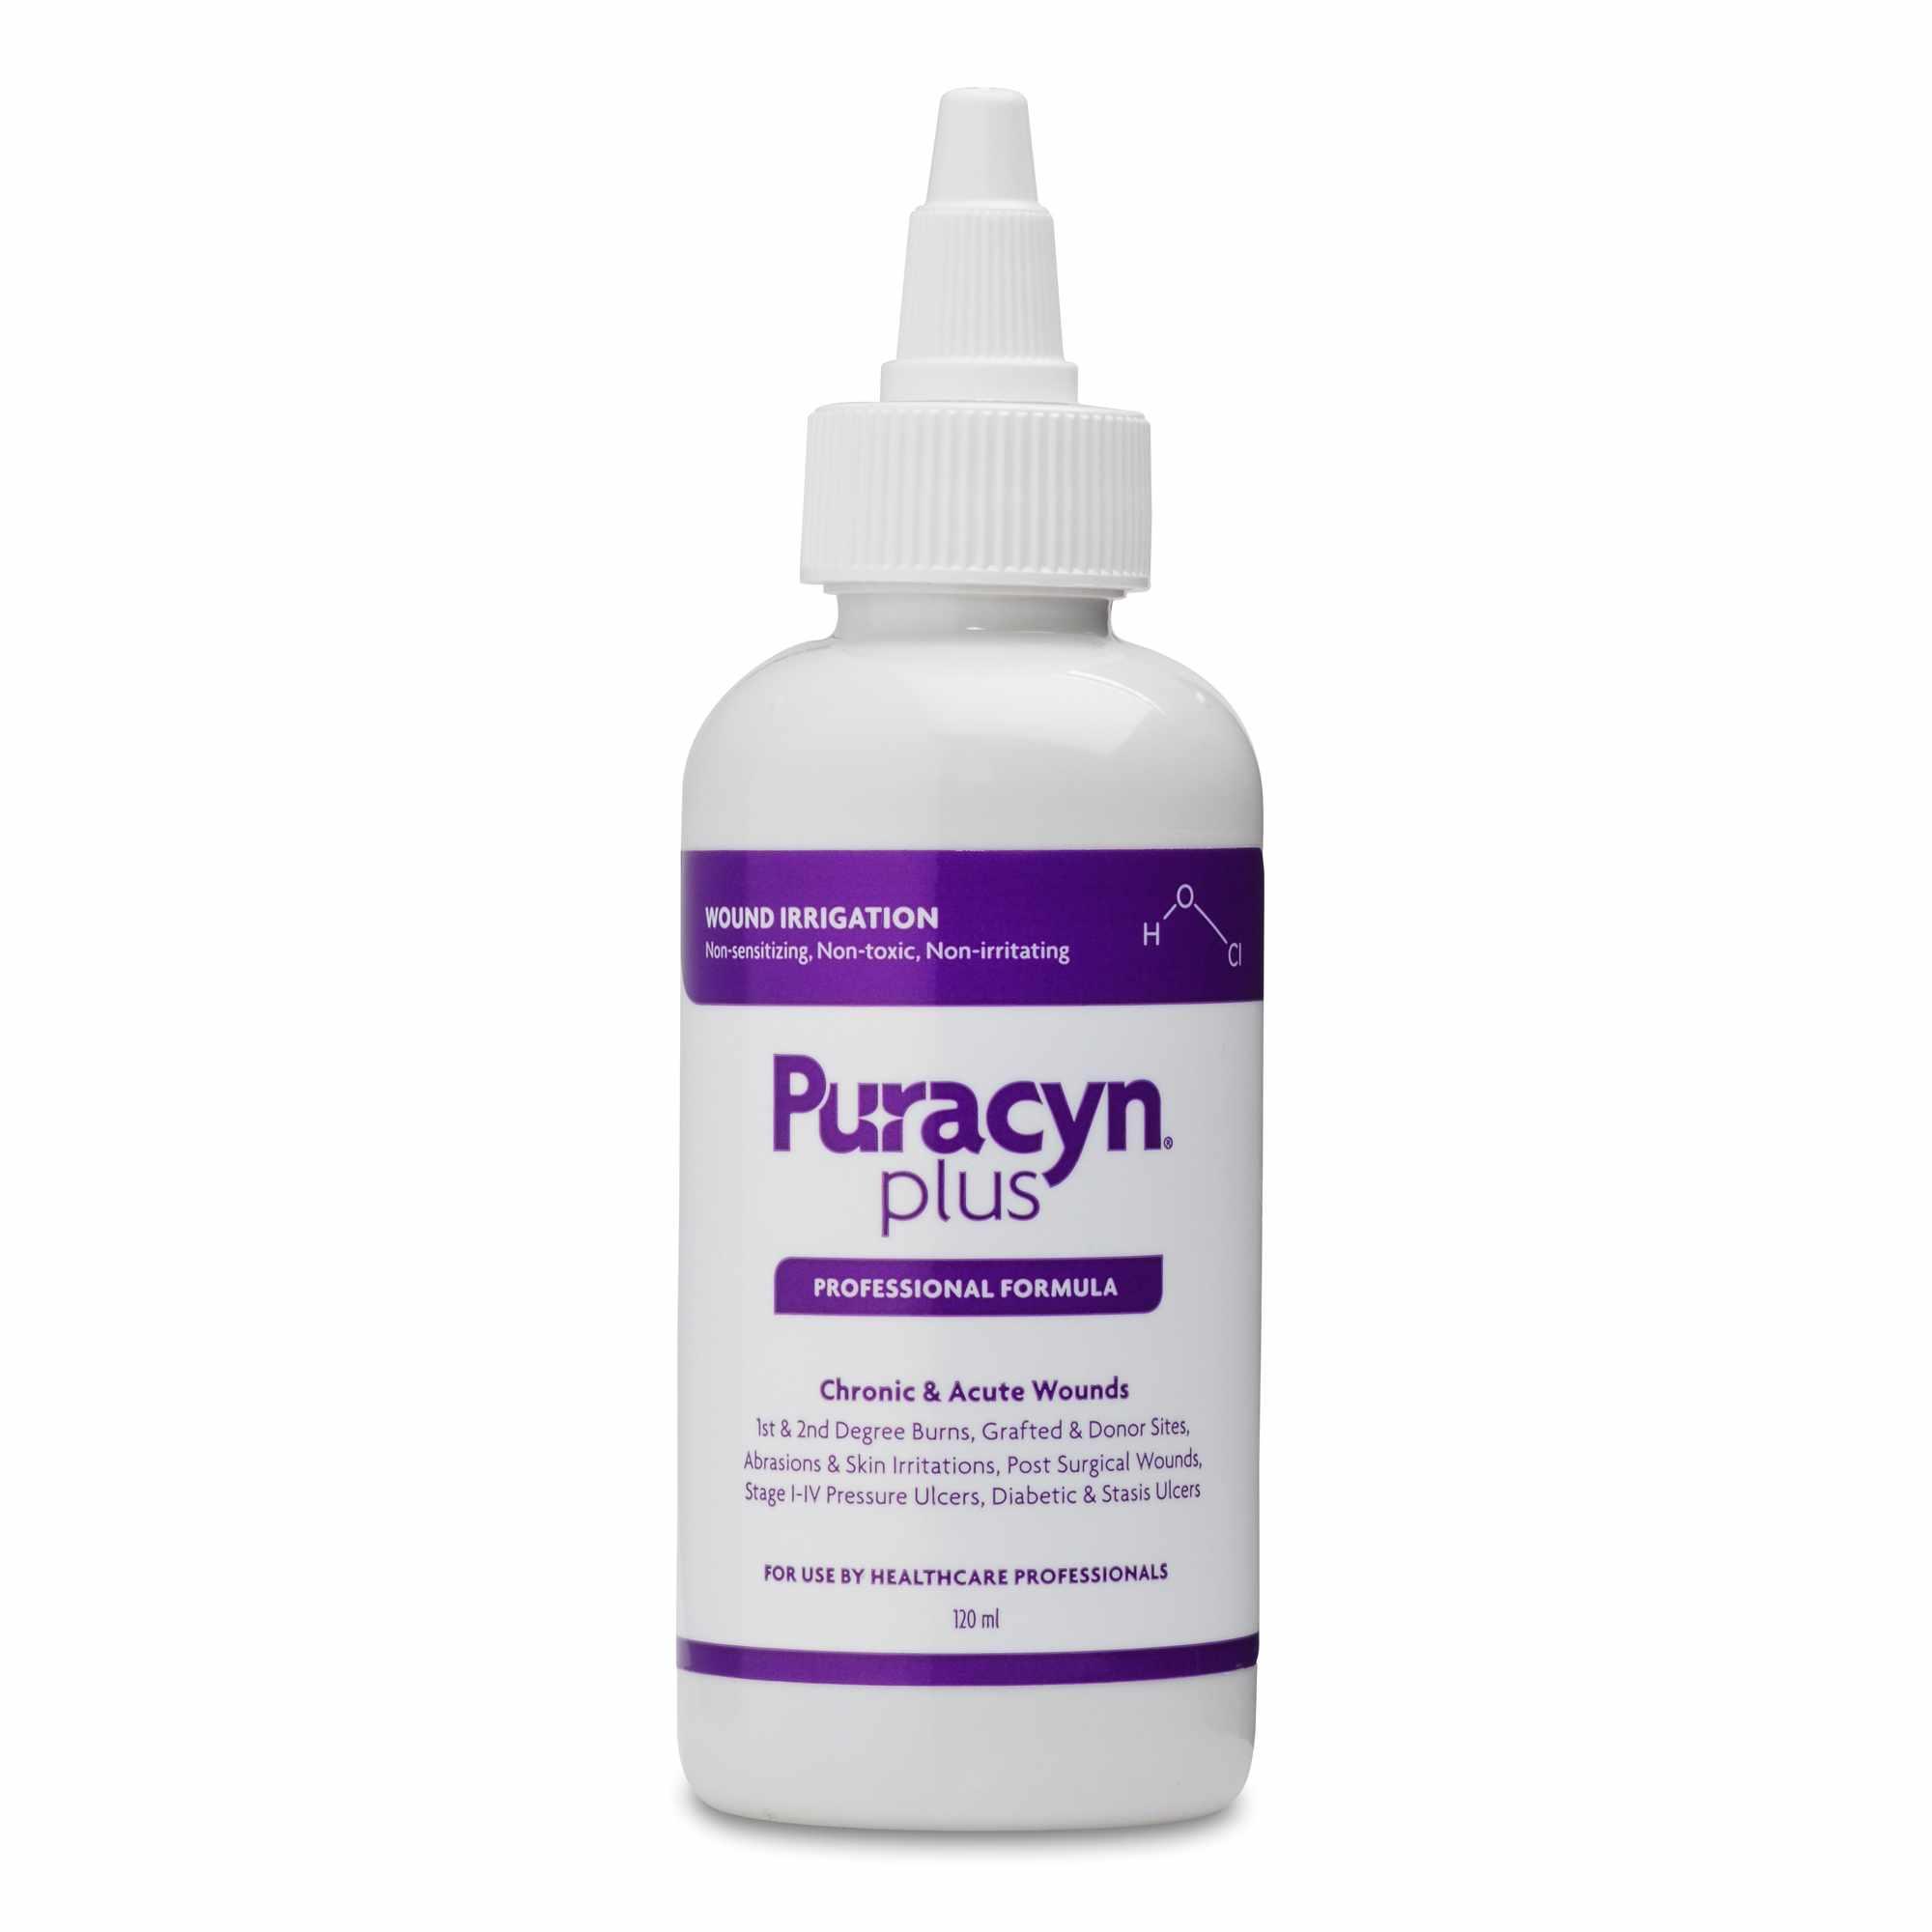 Puracyn Plus Professional Wound Irrigation Solution, 120 mL